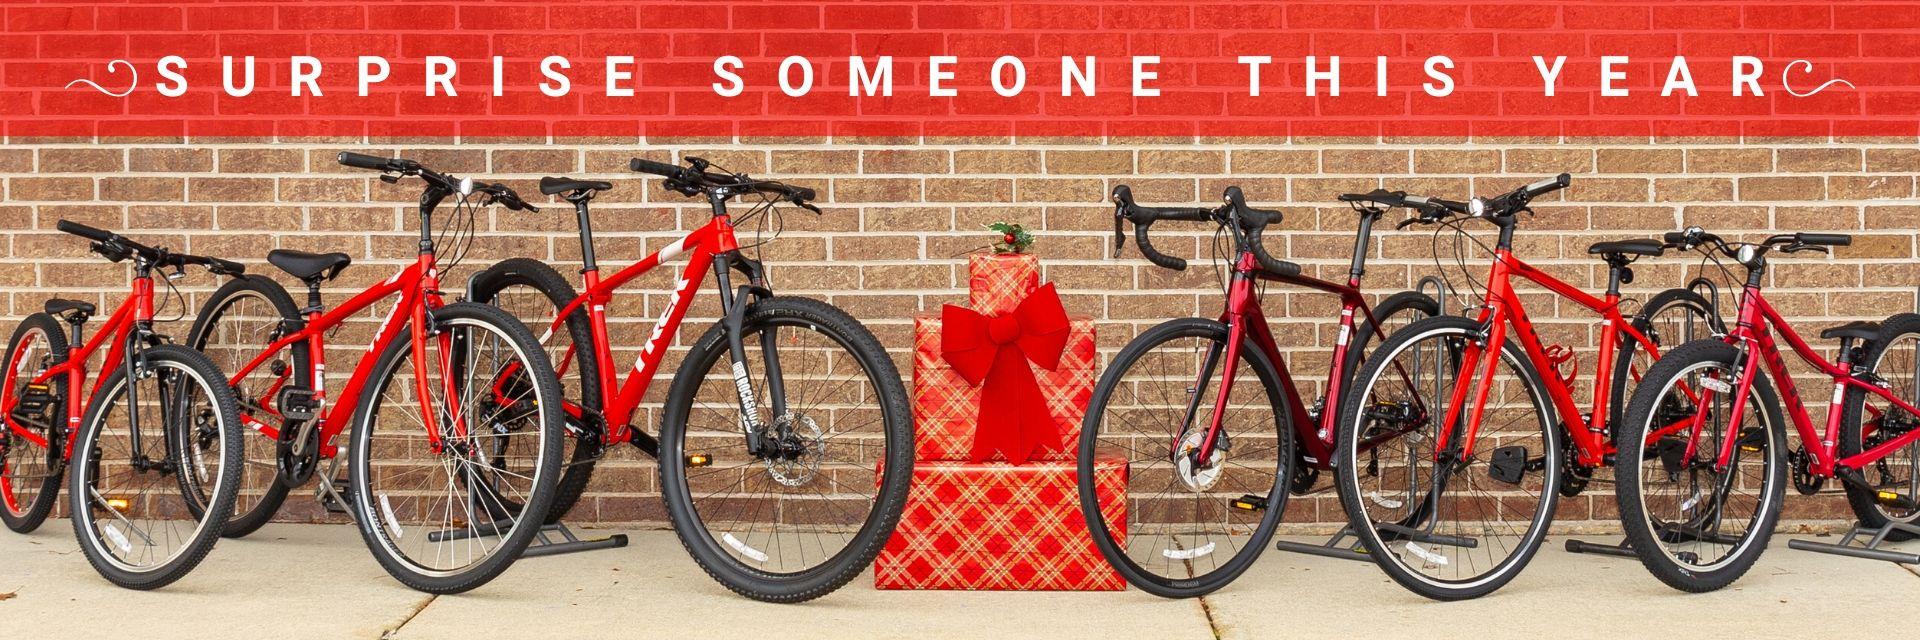 Bike Surprise